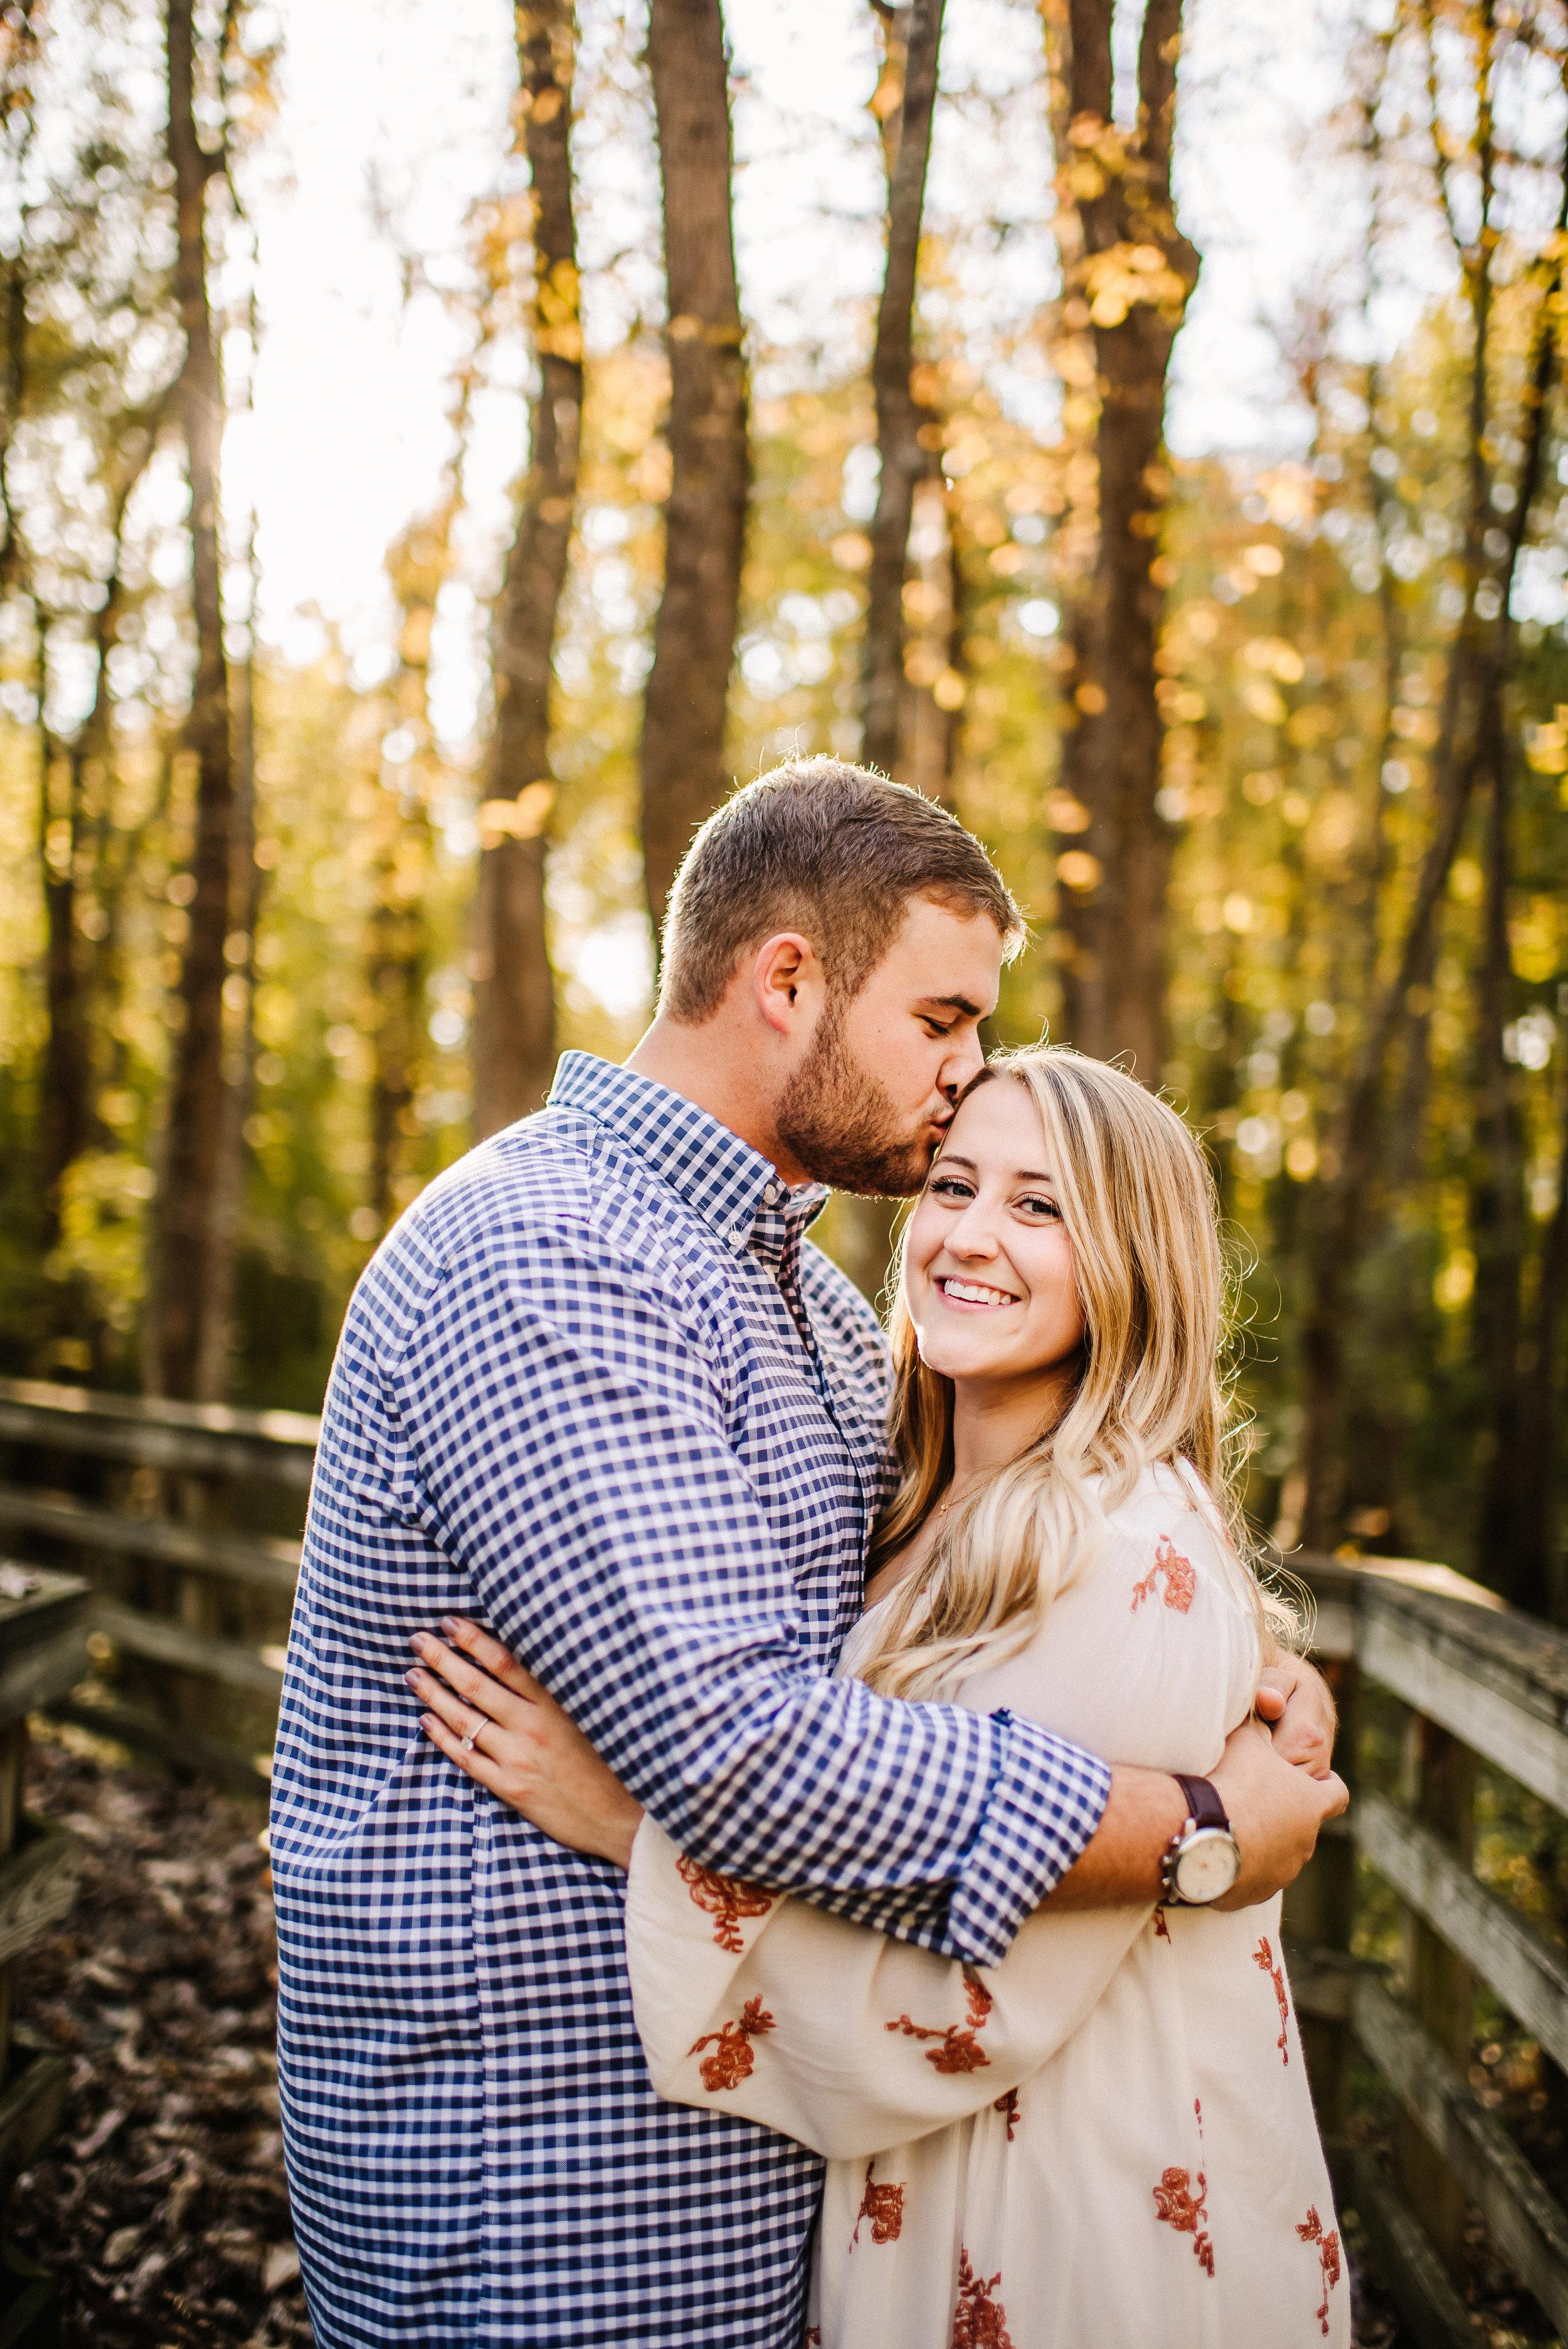 Romantic Fall Engagement Photography_Alexis & Jacob_Ashley Benham Photography-32.jpg